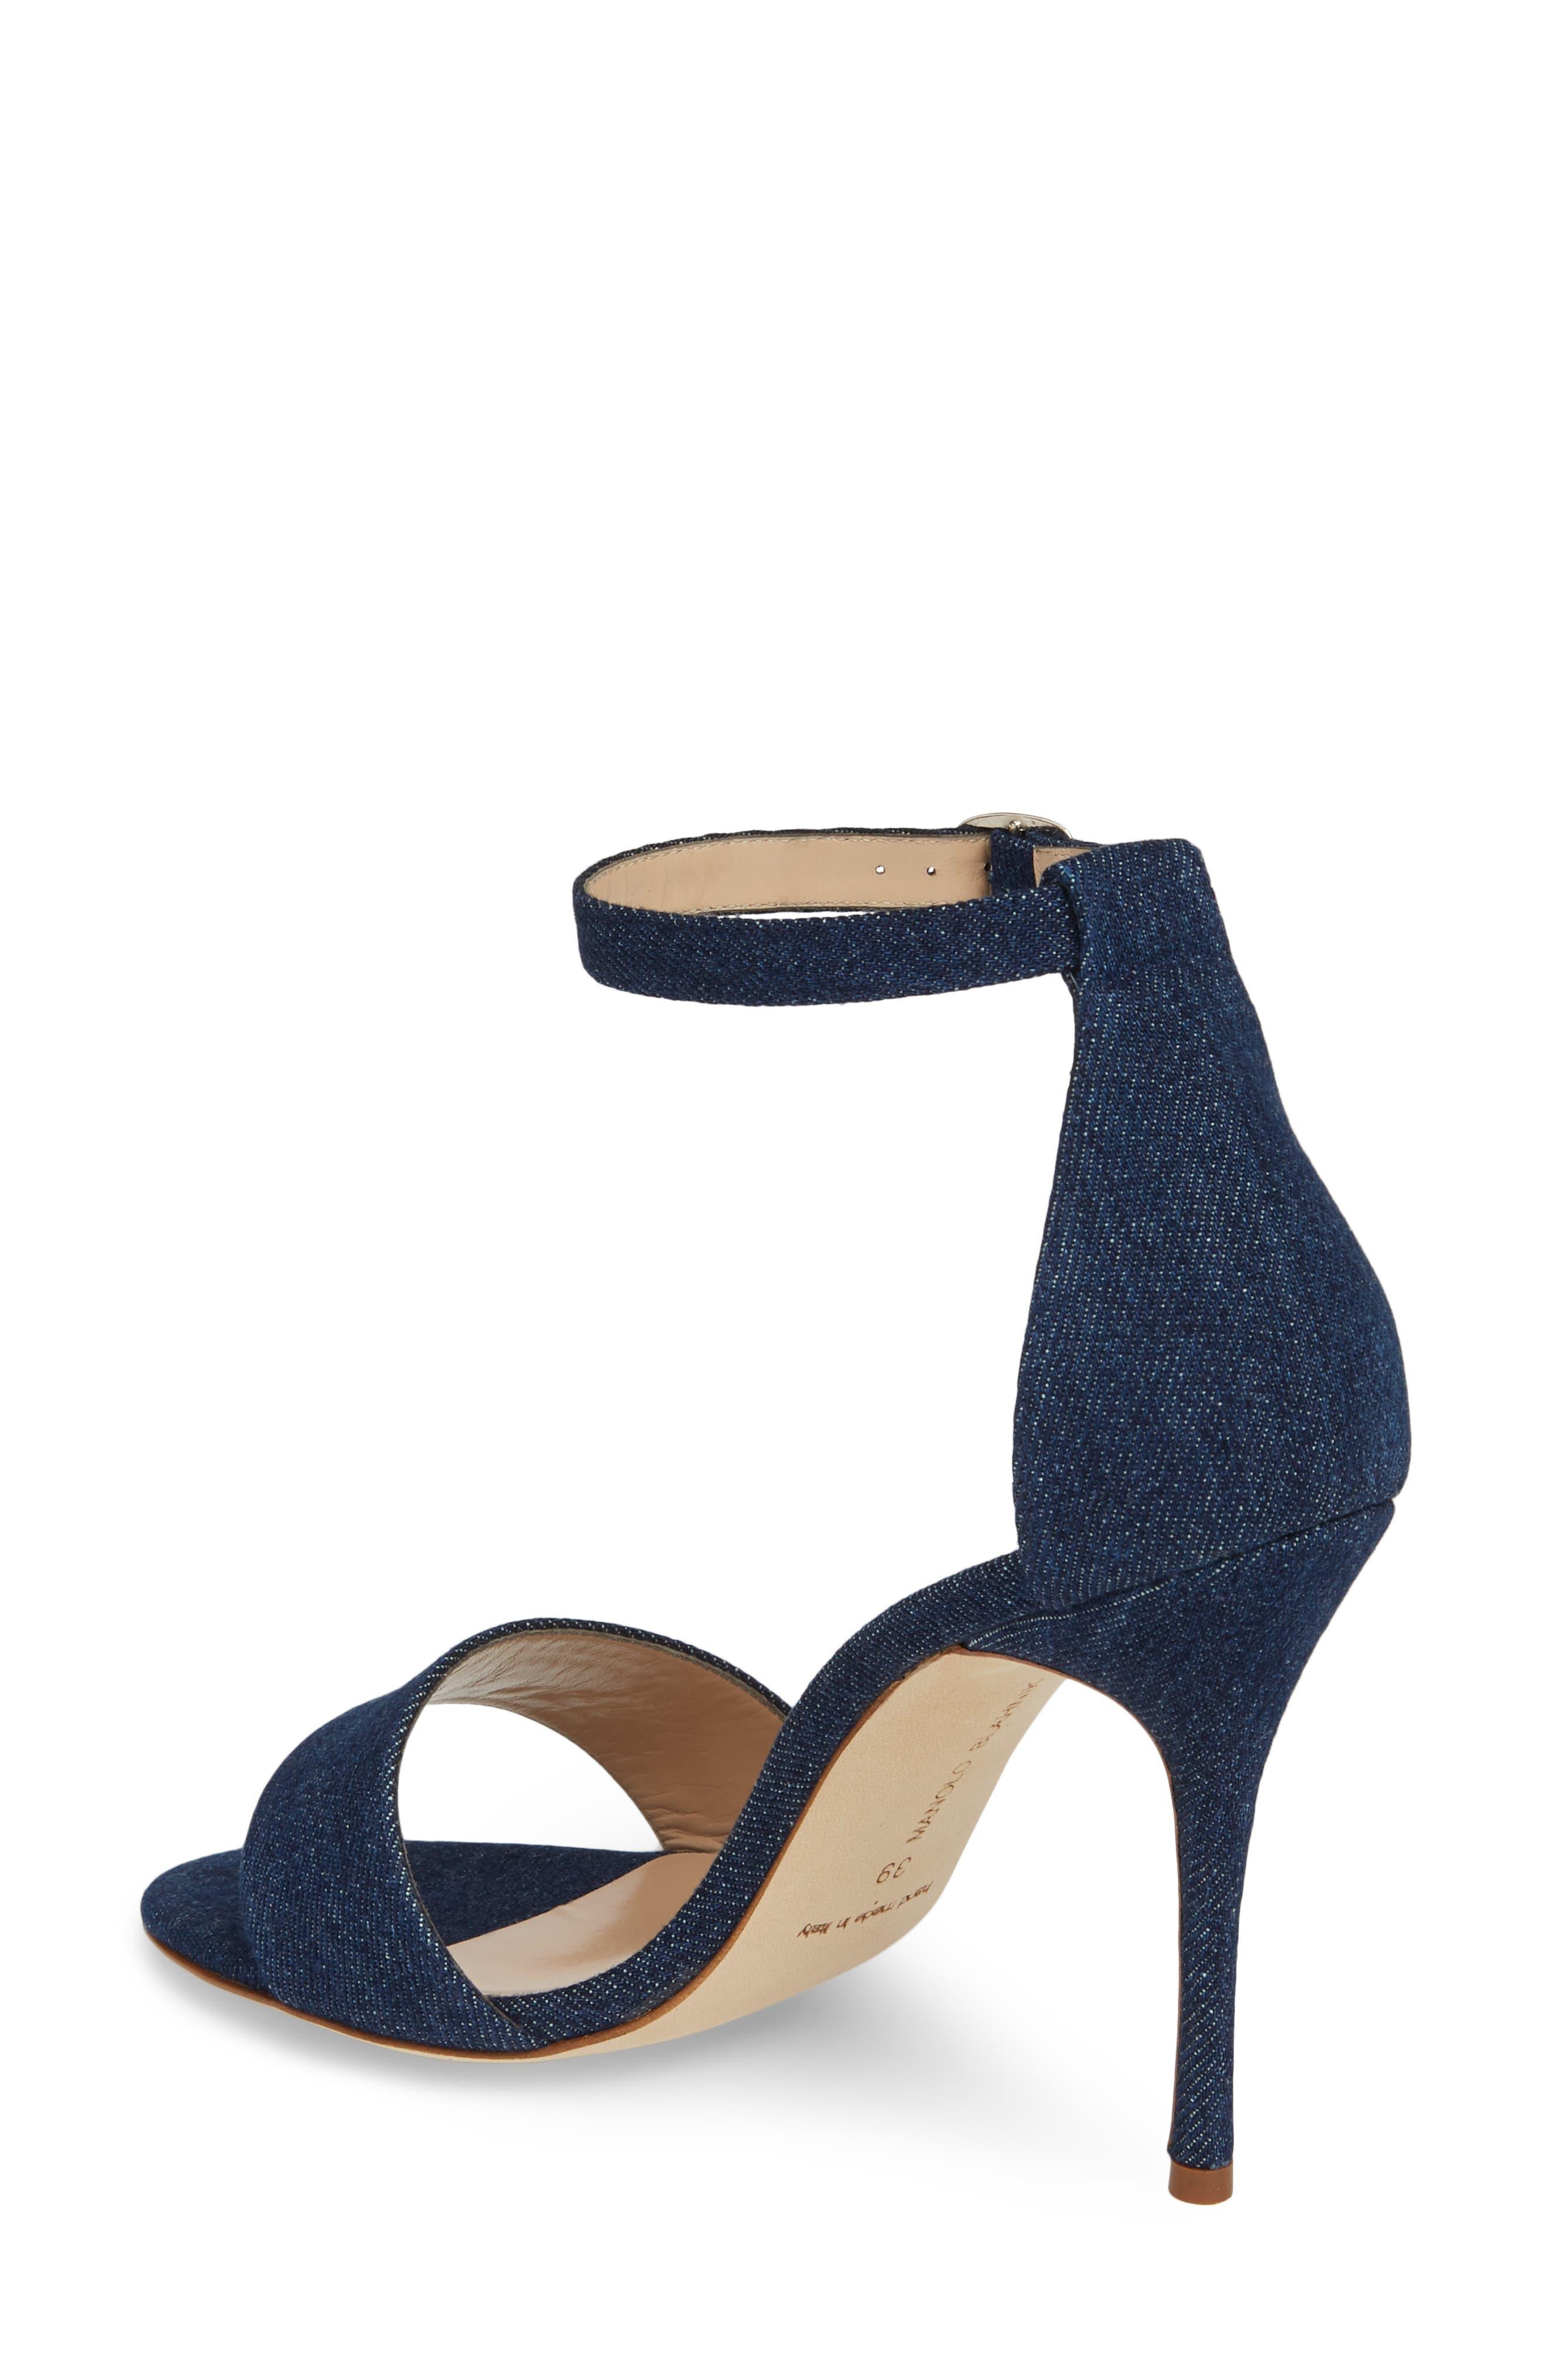 Tres Ankle Strap Sandal,                             Alternate thumbnail 2, color,                             DENIM BLUE